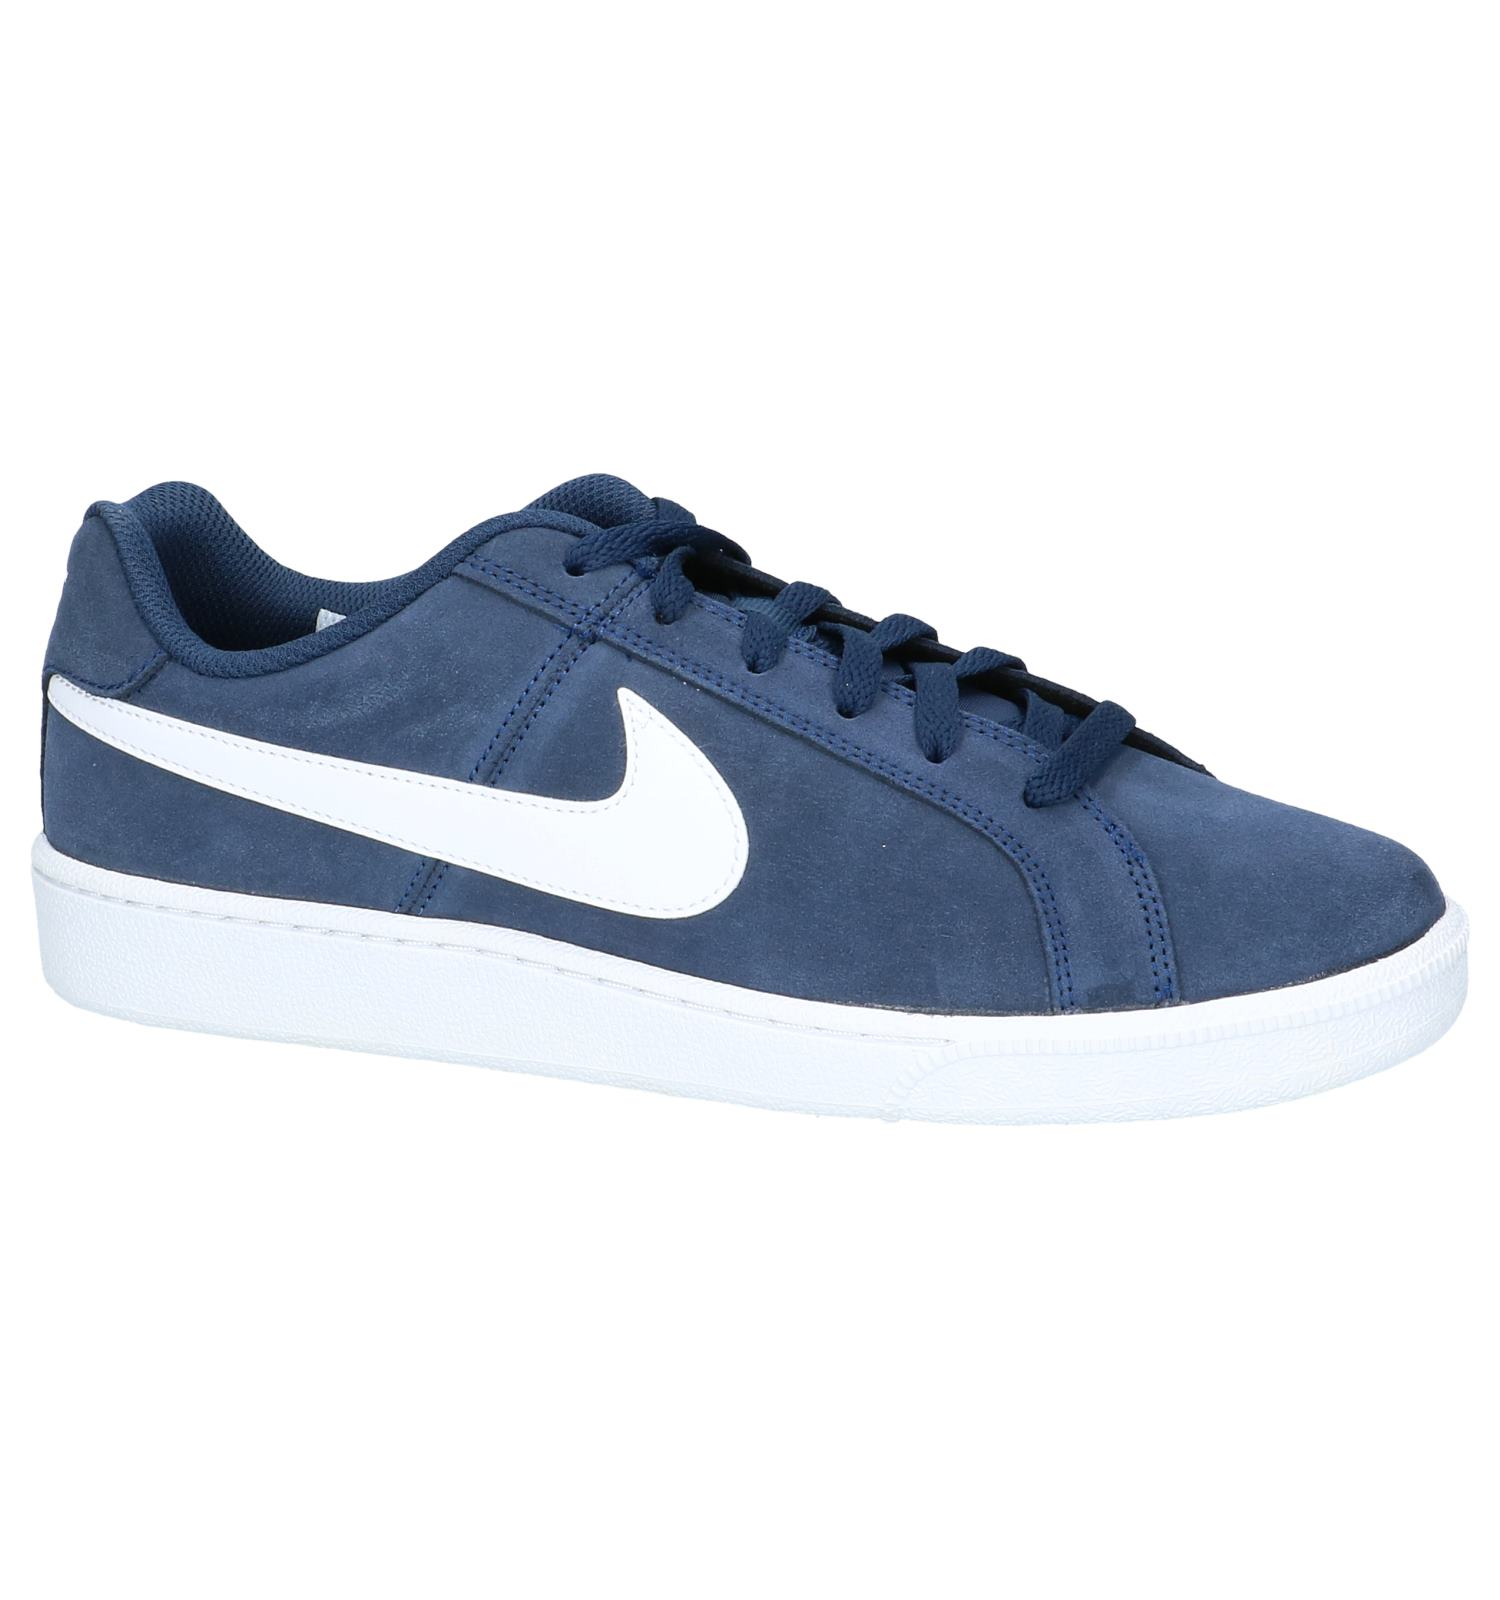 Sneakers Donker Blauwe Royale Gratis SuedeTorfs Nike be Court wk8OnX0P